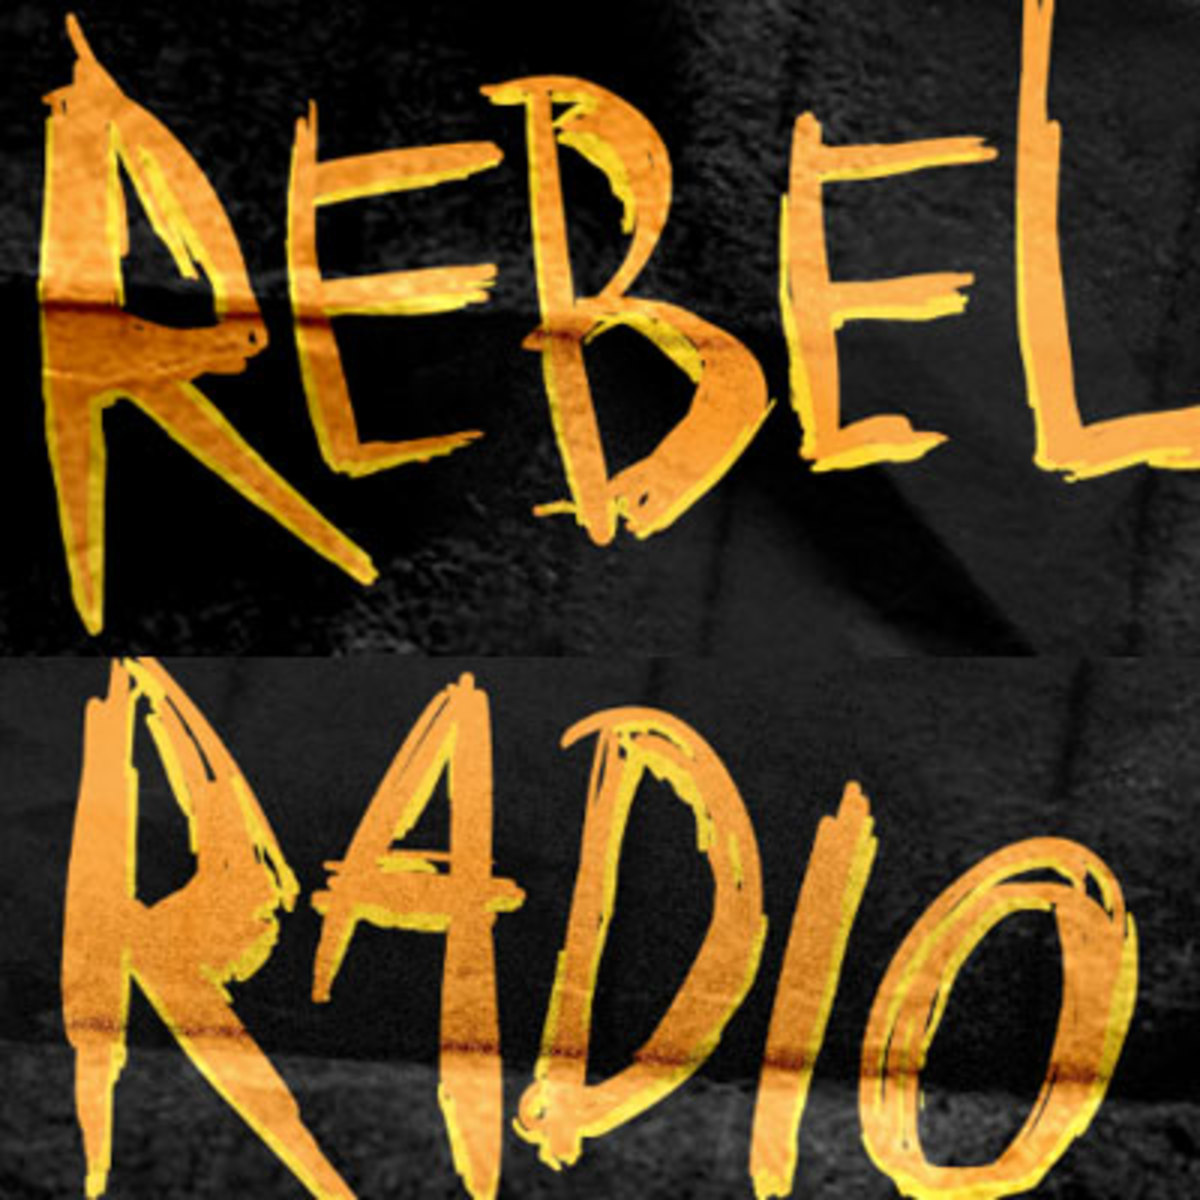 rebelradio.jpg